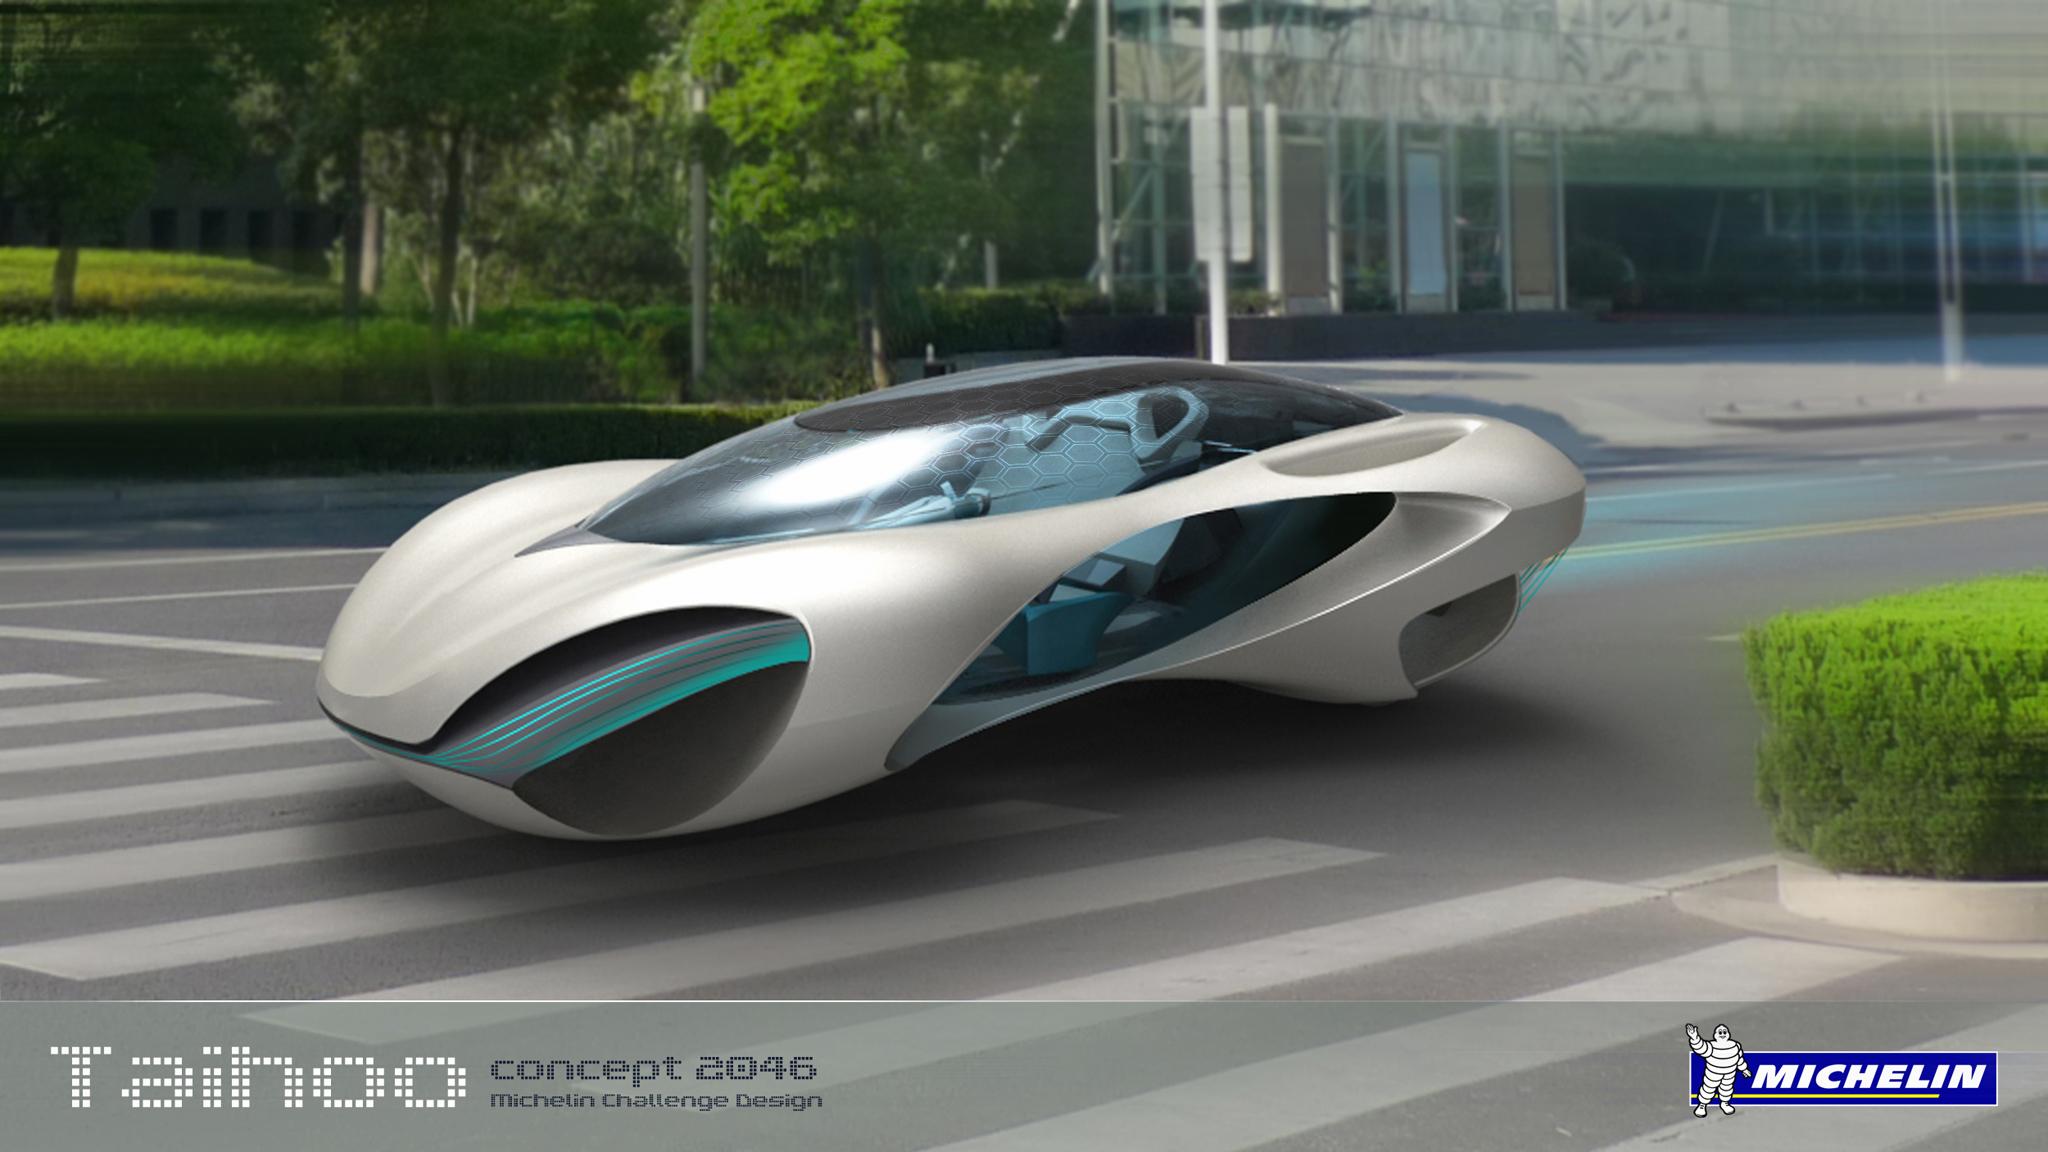 Taihoo Concept 2046 By Hao Huang, China